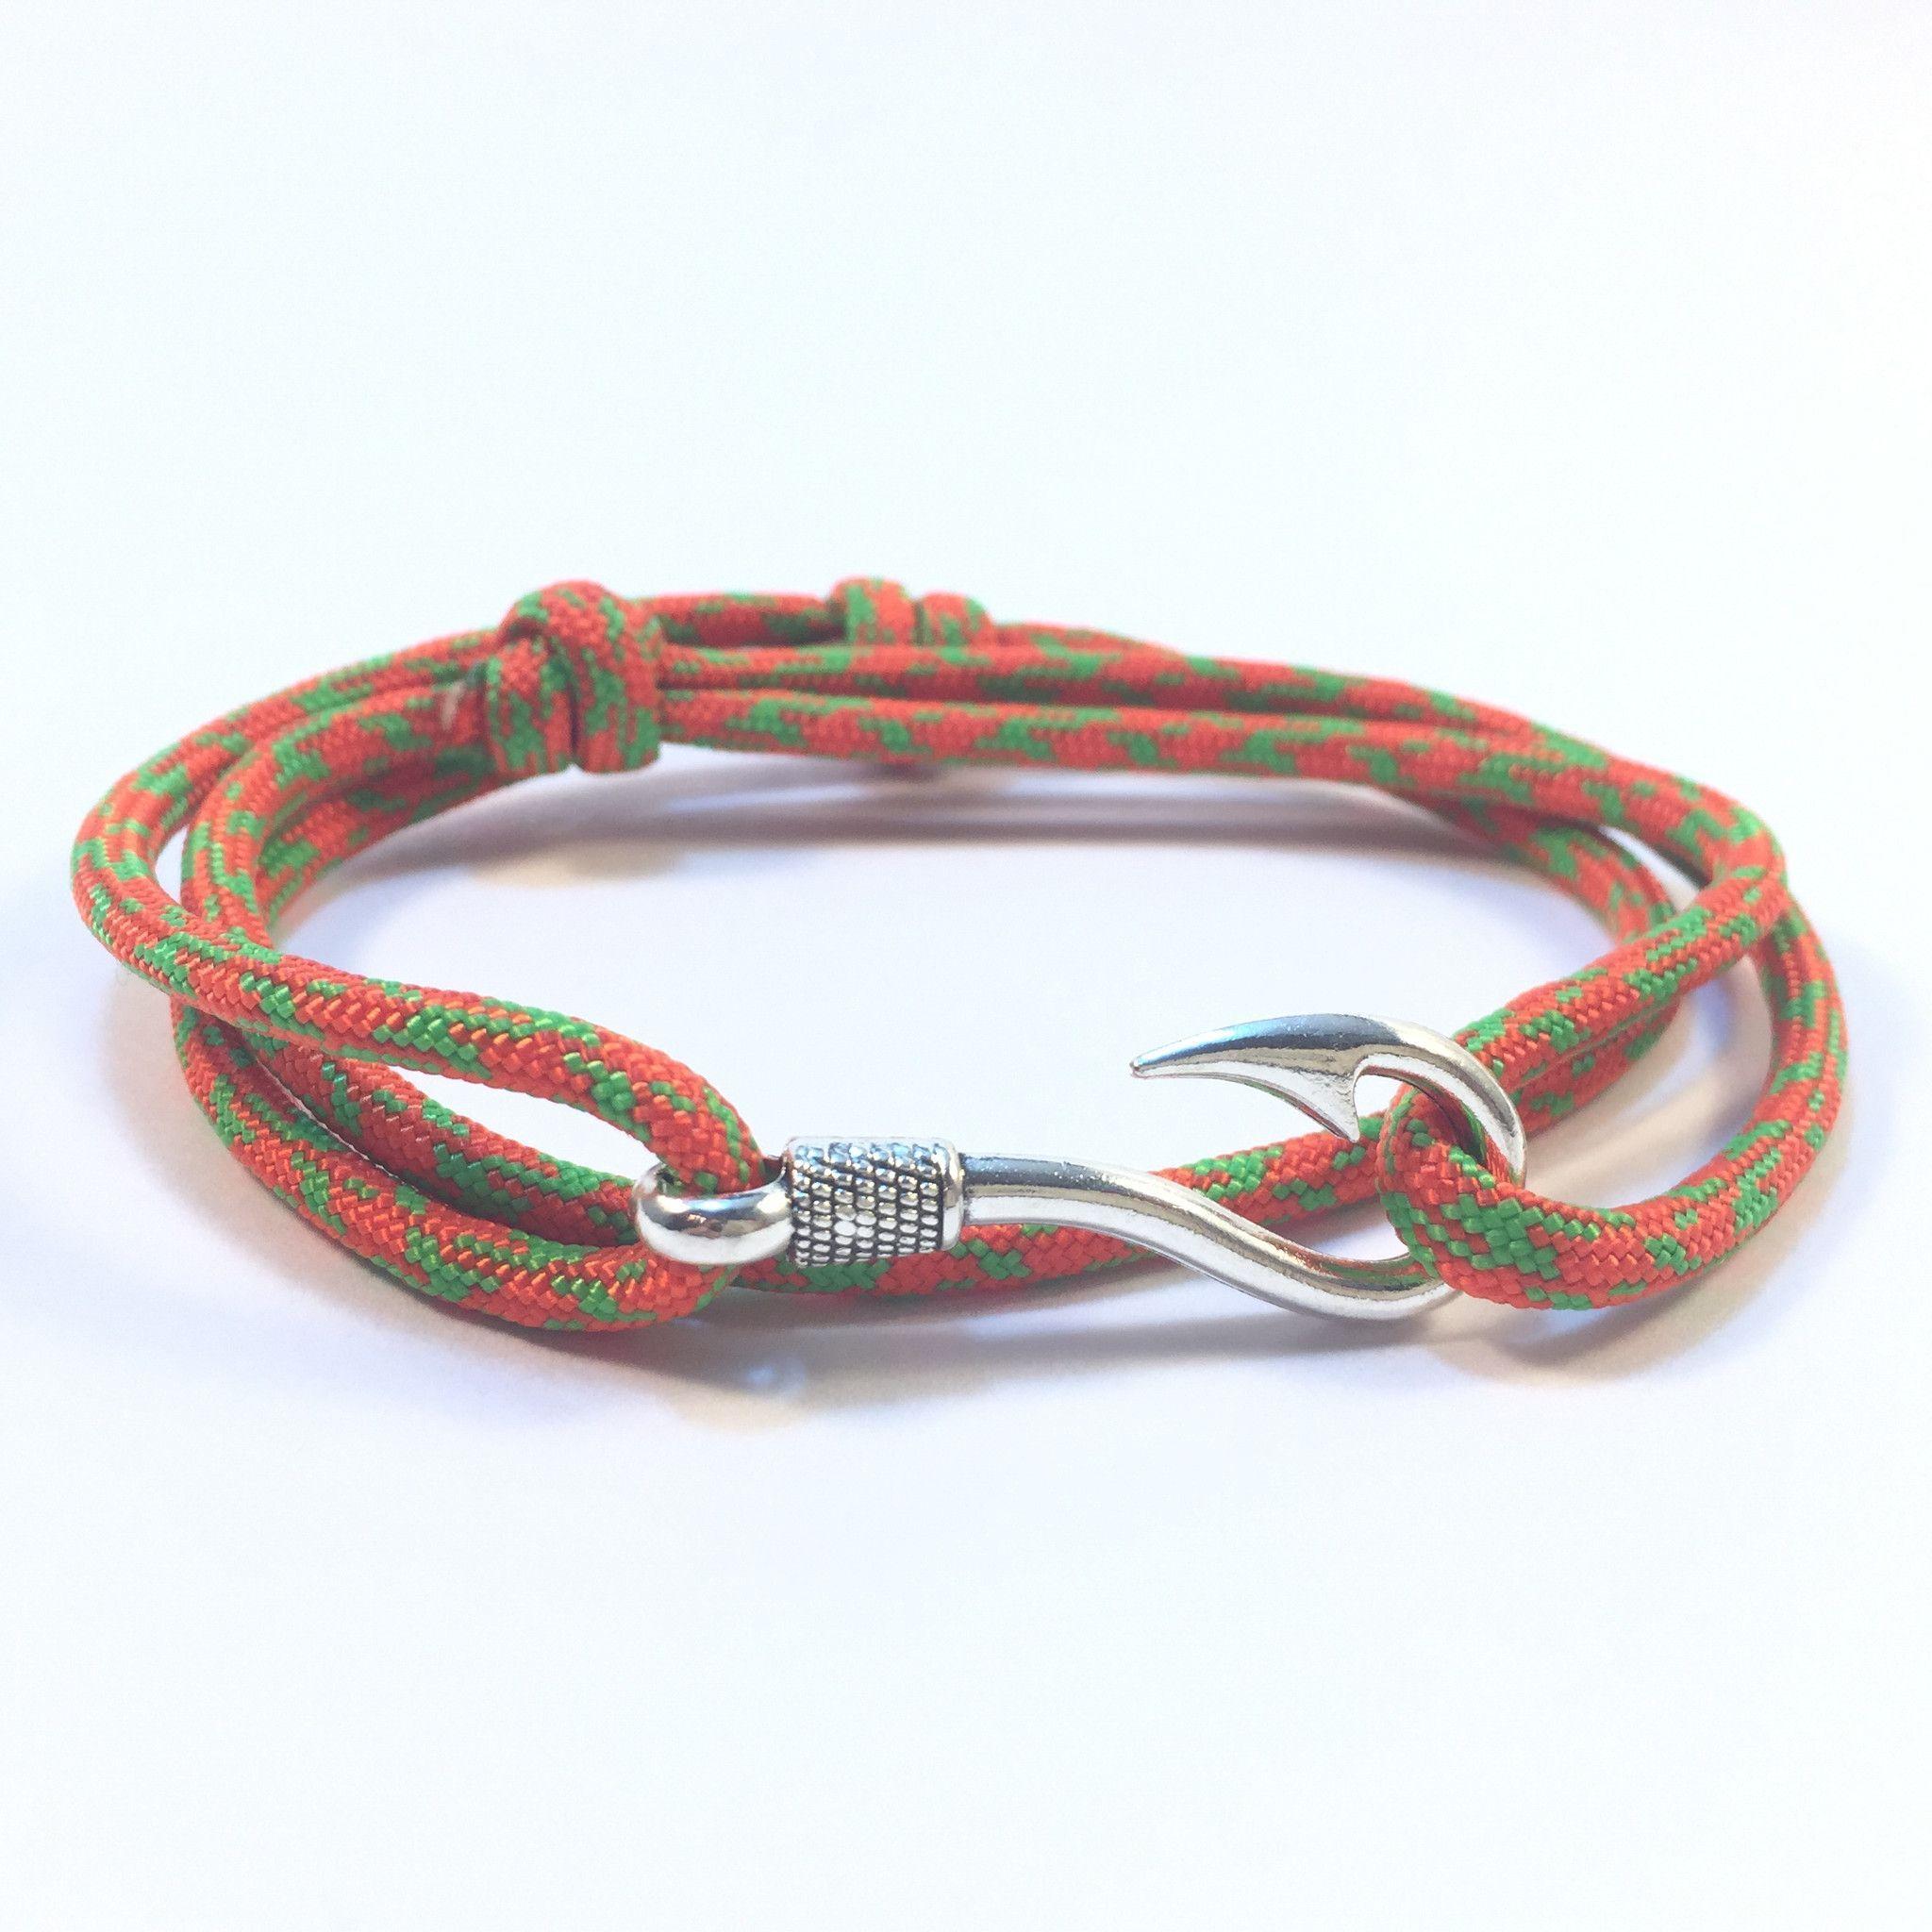 Orange Green Camo Fish Hook Adjule Paracord Bracelet